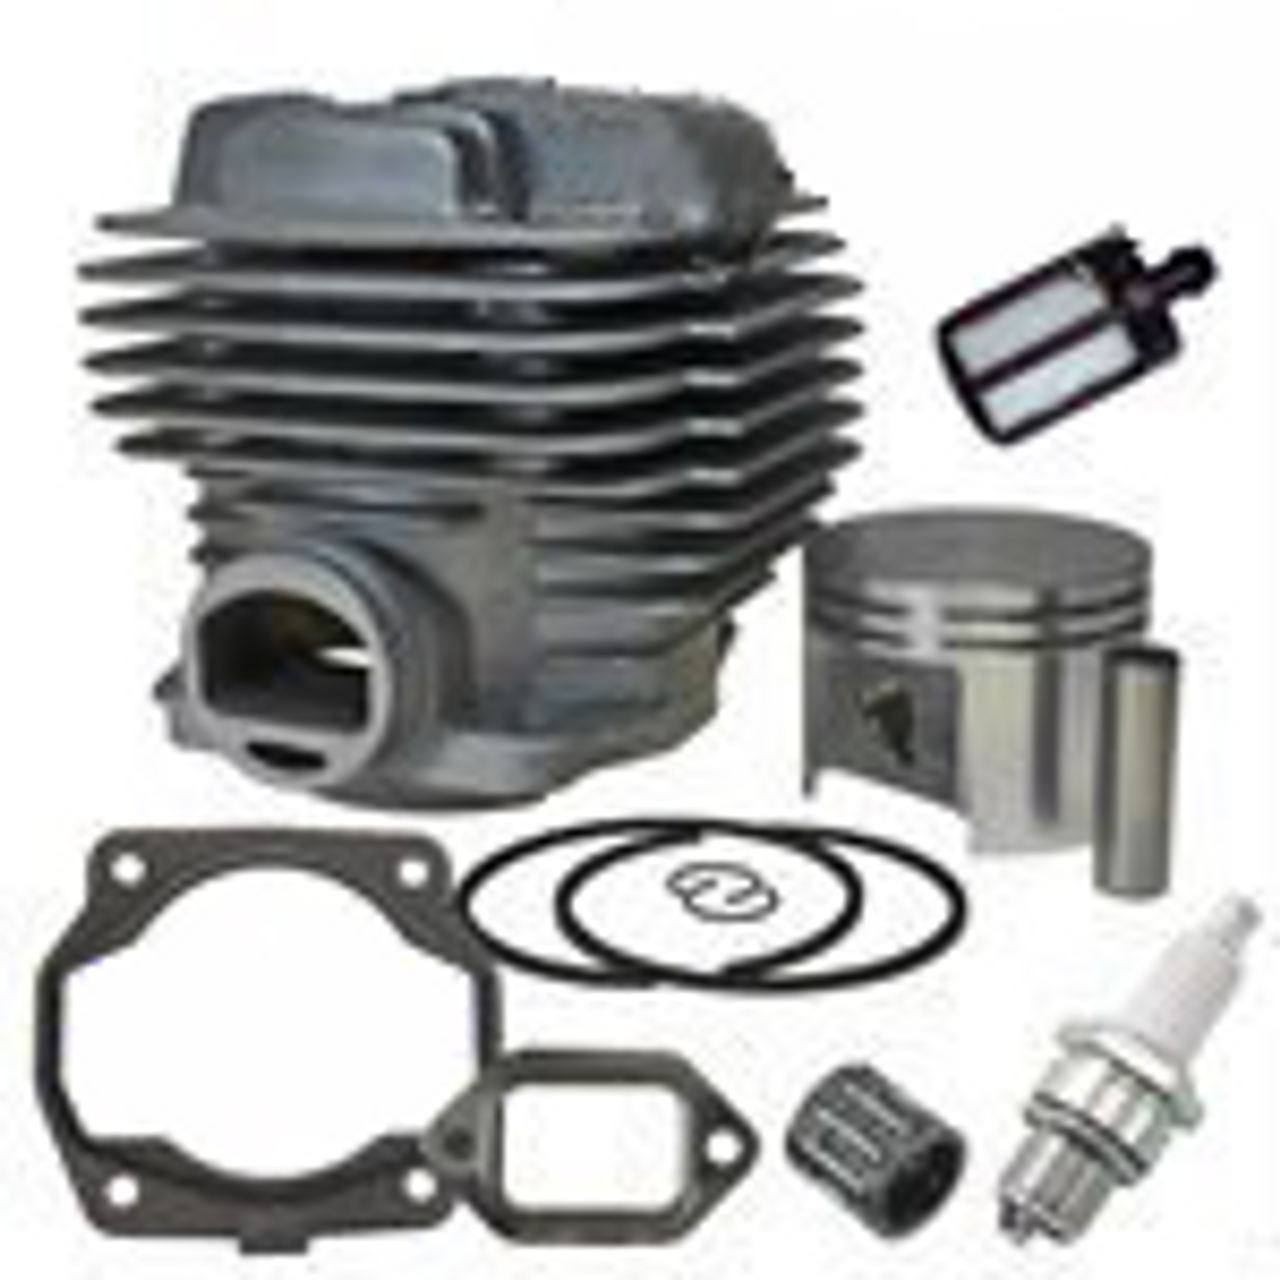 Cylinder Rebuild Kit Fits Stihl TS410// TS420 Piston Gaskets Piston Rings Cut Off